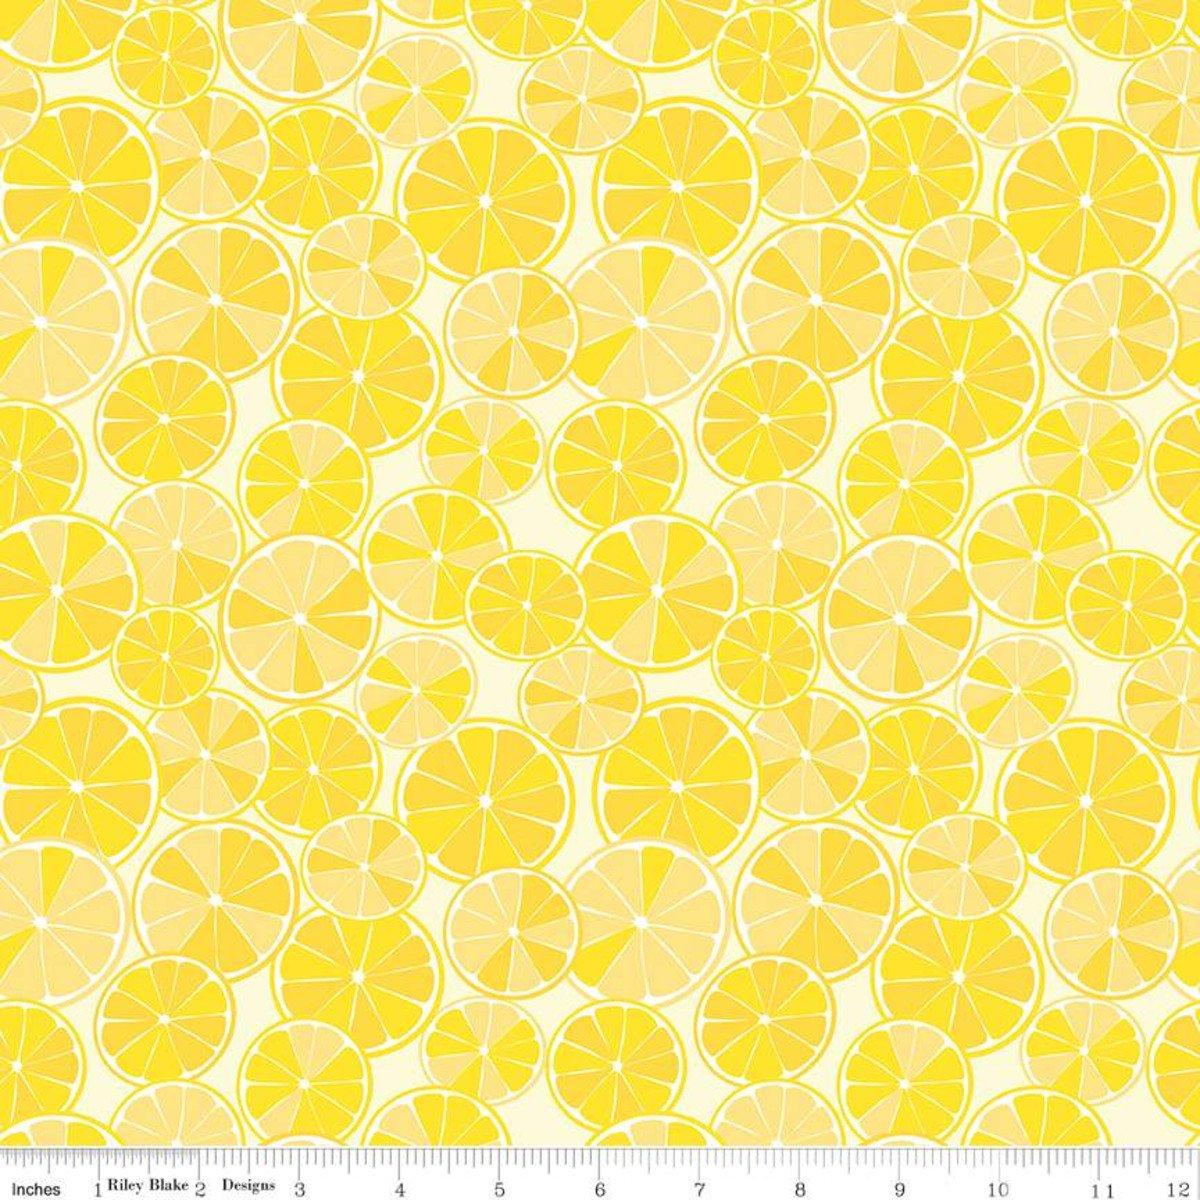 Grove Slices Lemonade